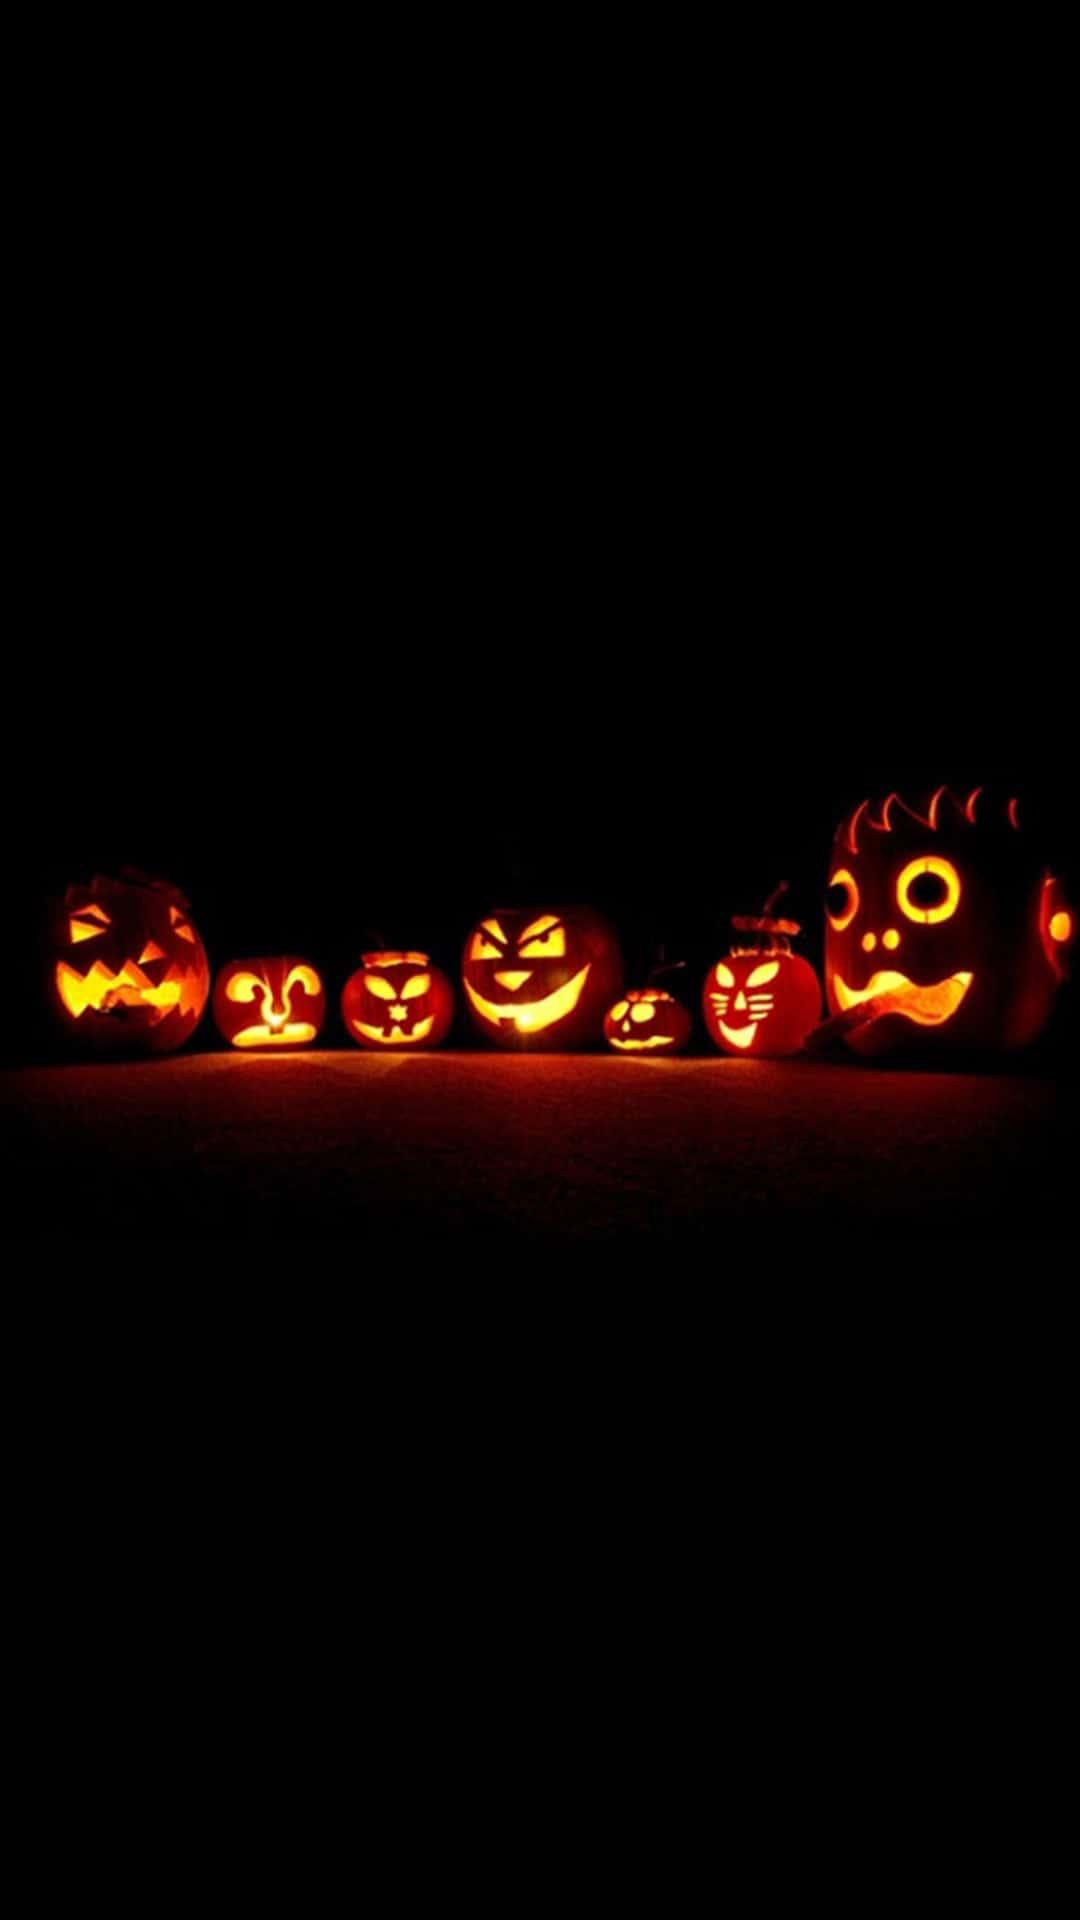 Glowing Halloween Pumpkins Android Wallpaper